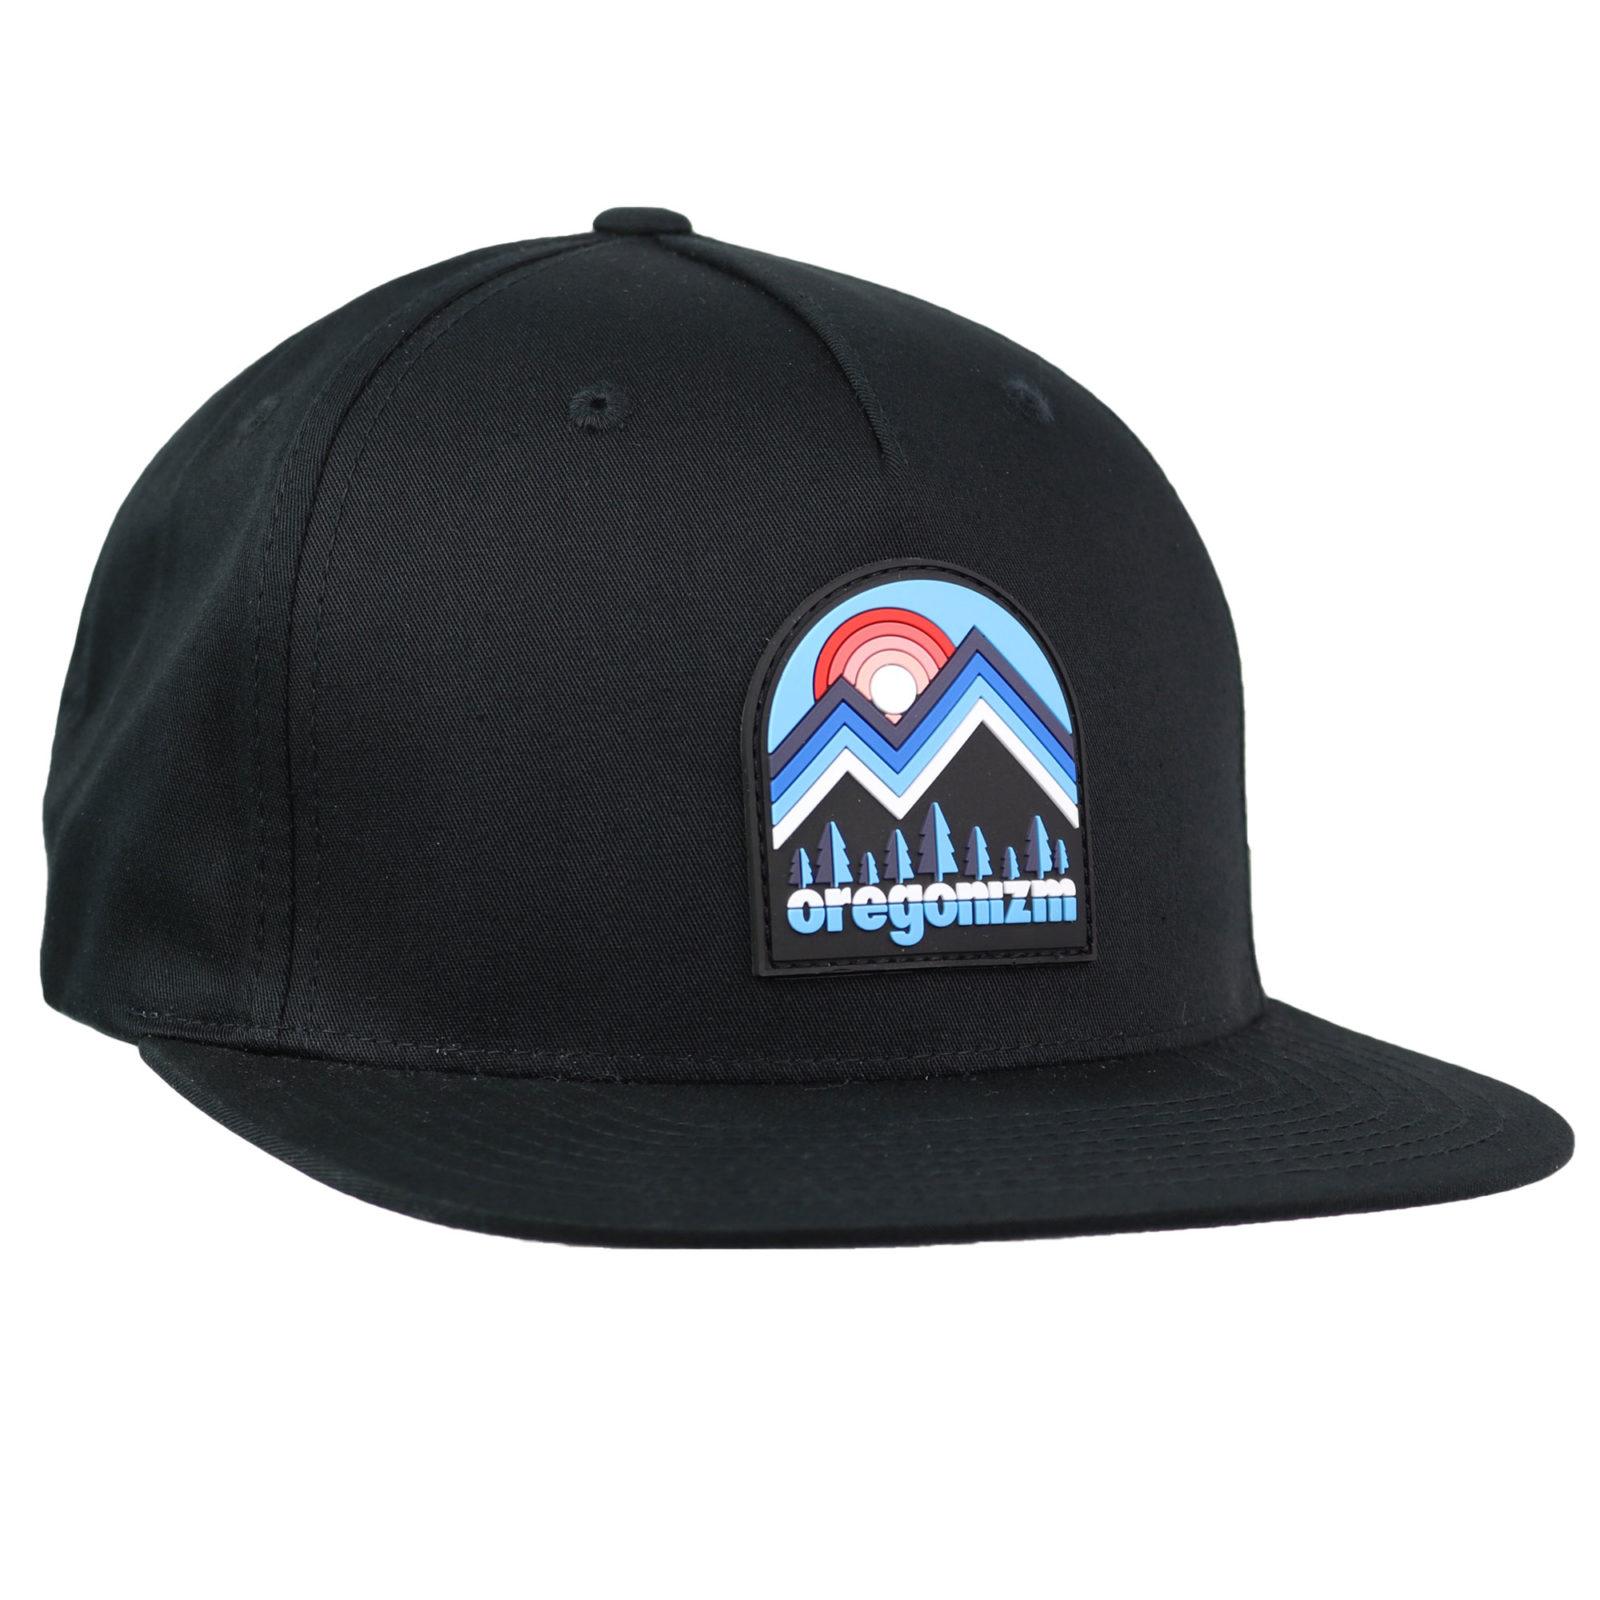 izm-product-hat-mountainscape-black